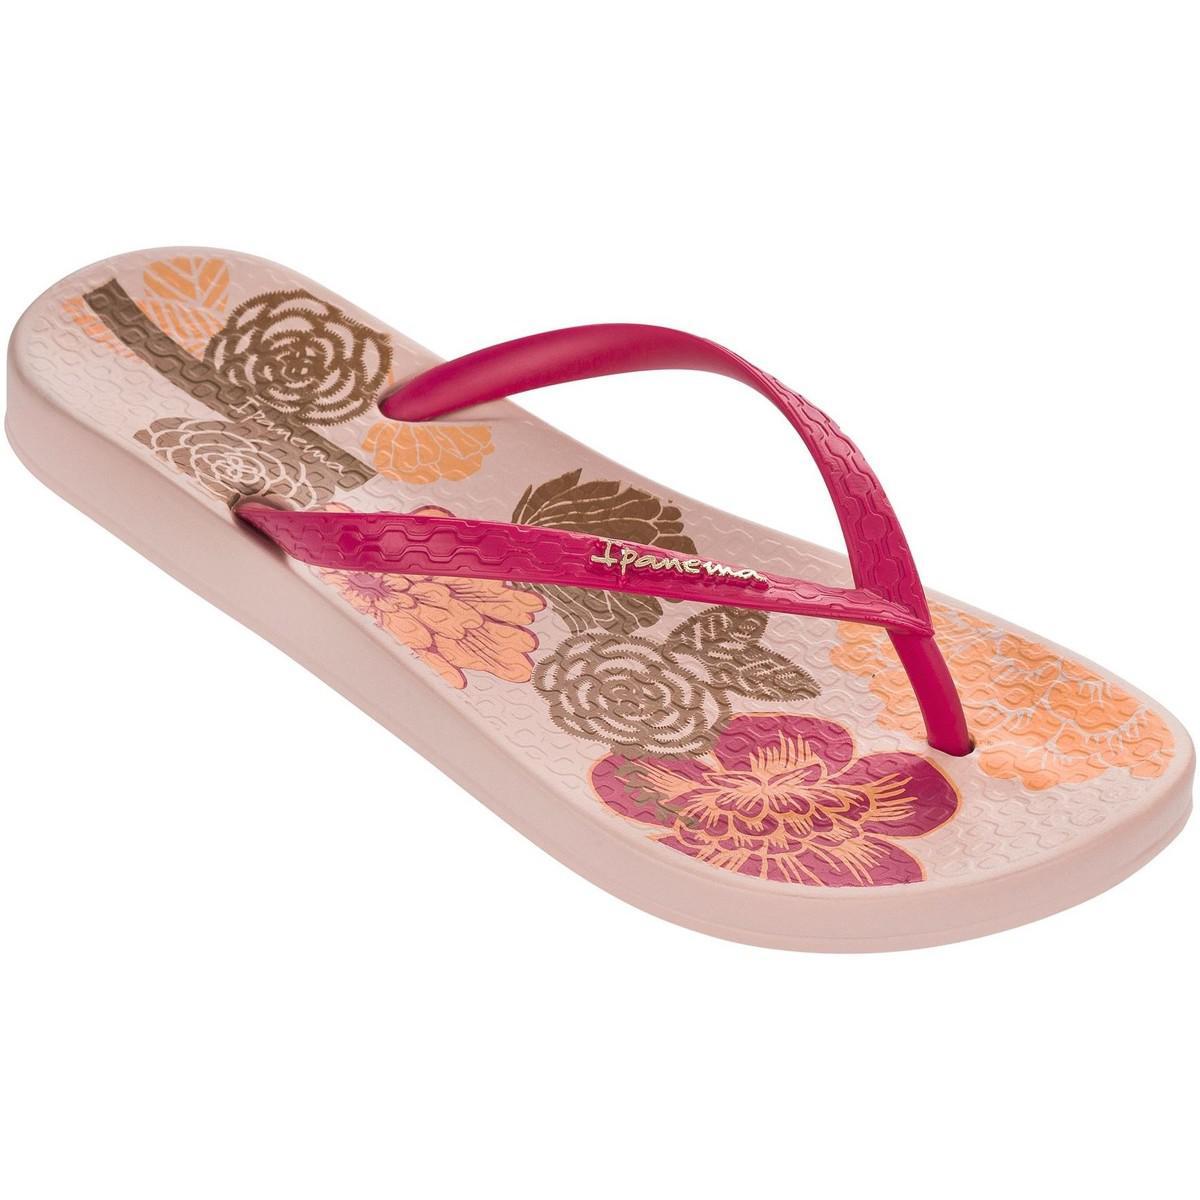 5153b2db8a4bec Ipanema - Petal V Flip Flops In Pink Flowers Print 81924 Women s Flip Flops    Sandals